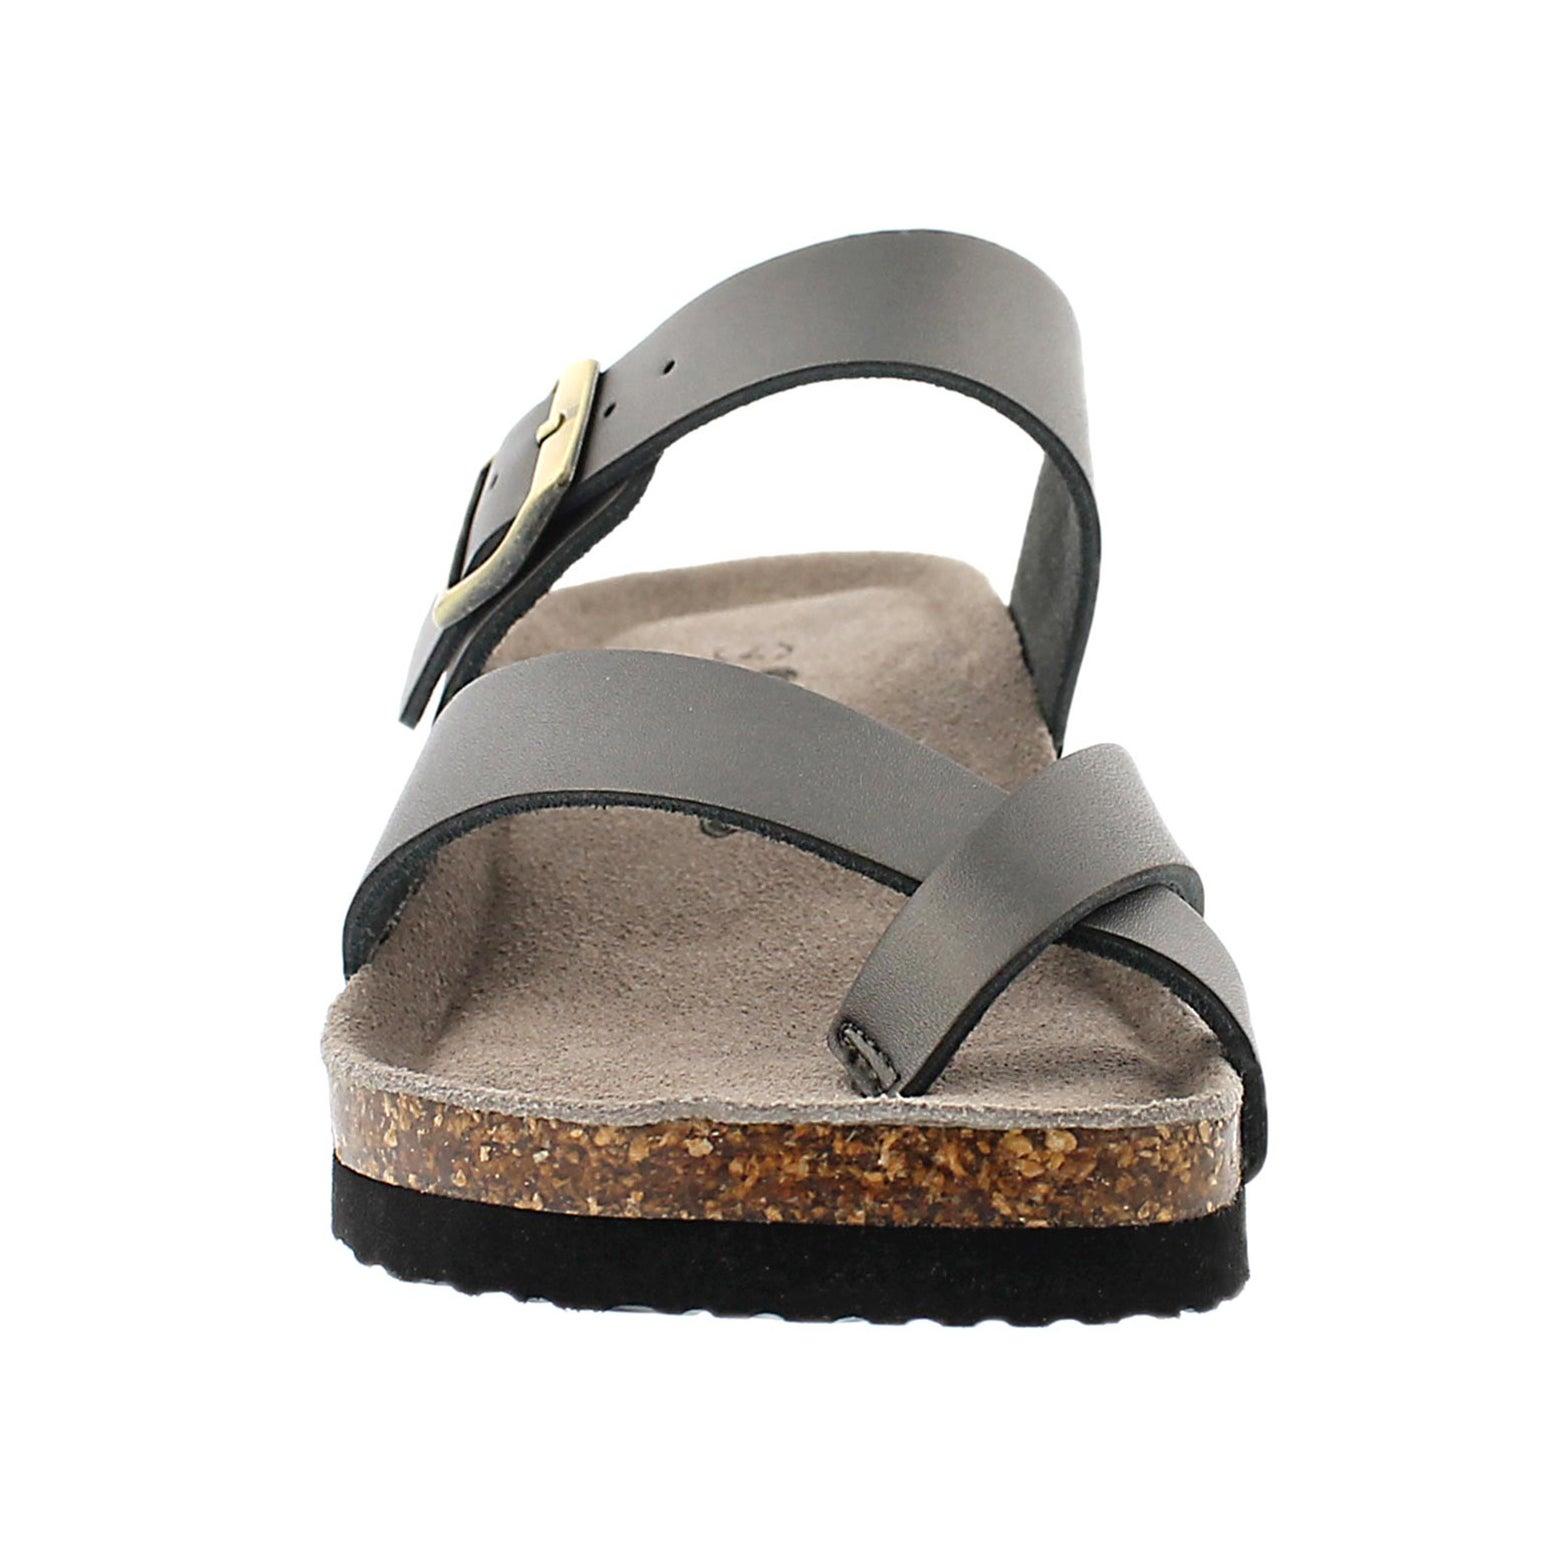 Lds Gemma pewter mem. foam wdge sandal